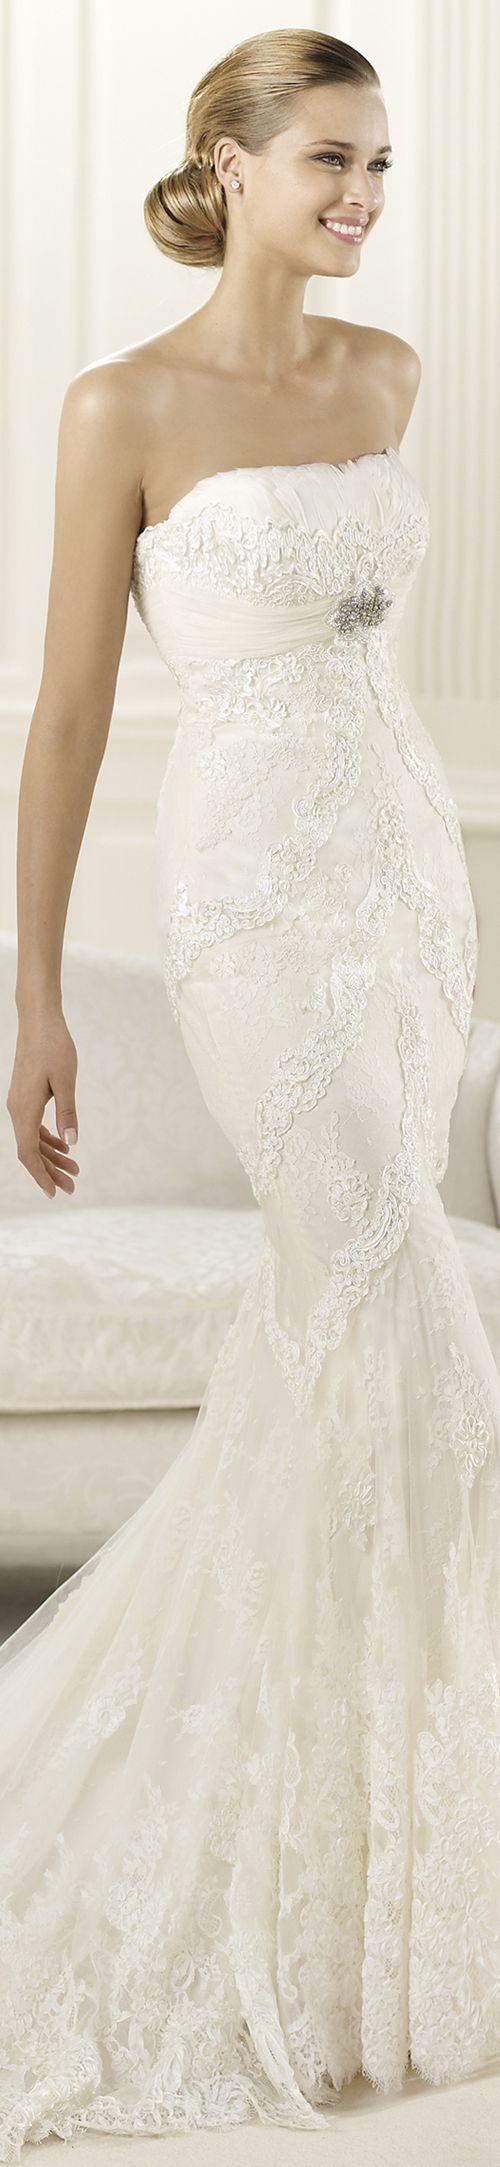 58 best wedding dress hunting images on pinterest wedding pronovias wedding dress dietrich ombrellifo Gallery